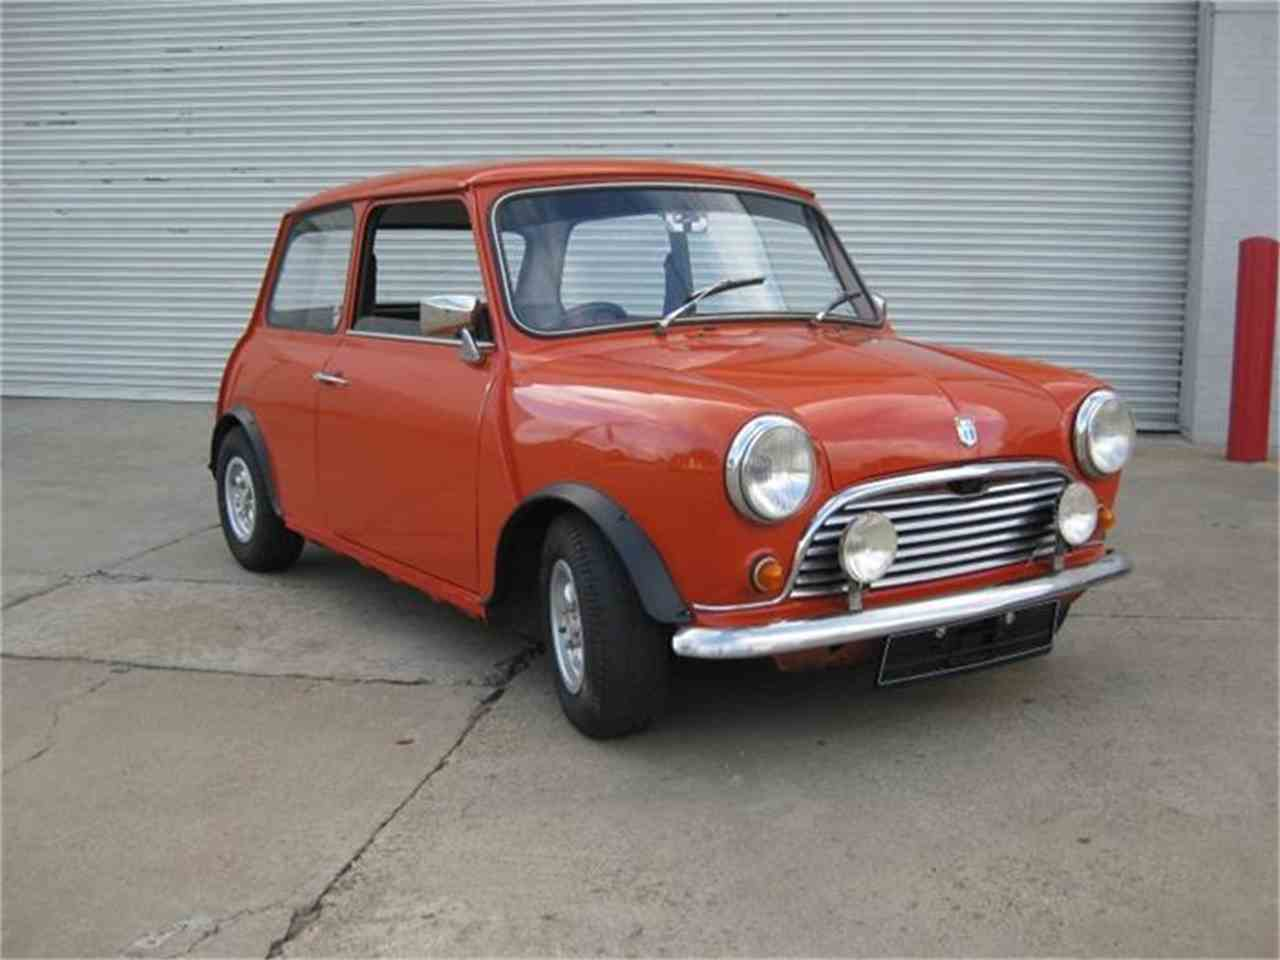 Classic Cars For Sale Houston Area: 1975 MINI Mark For Sale